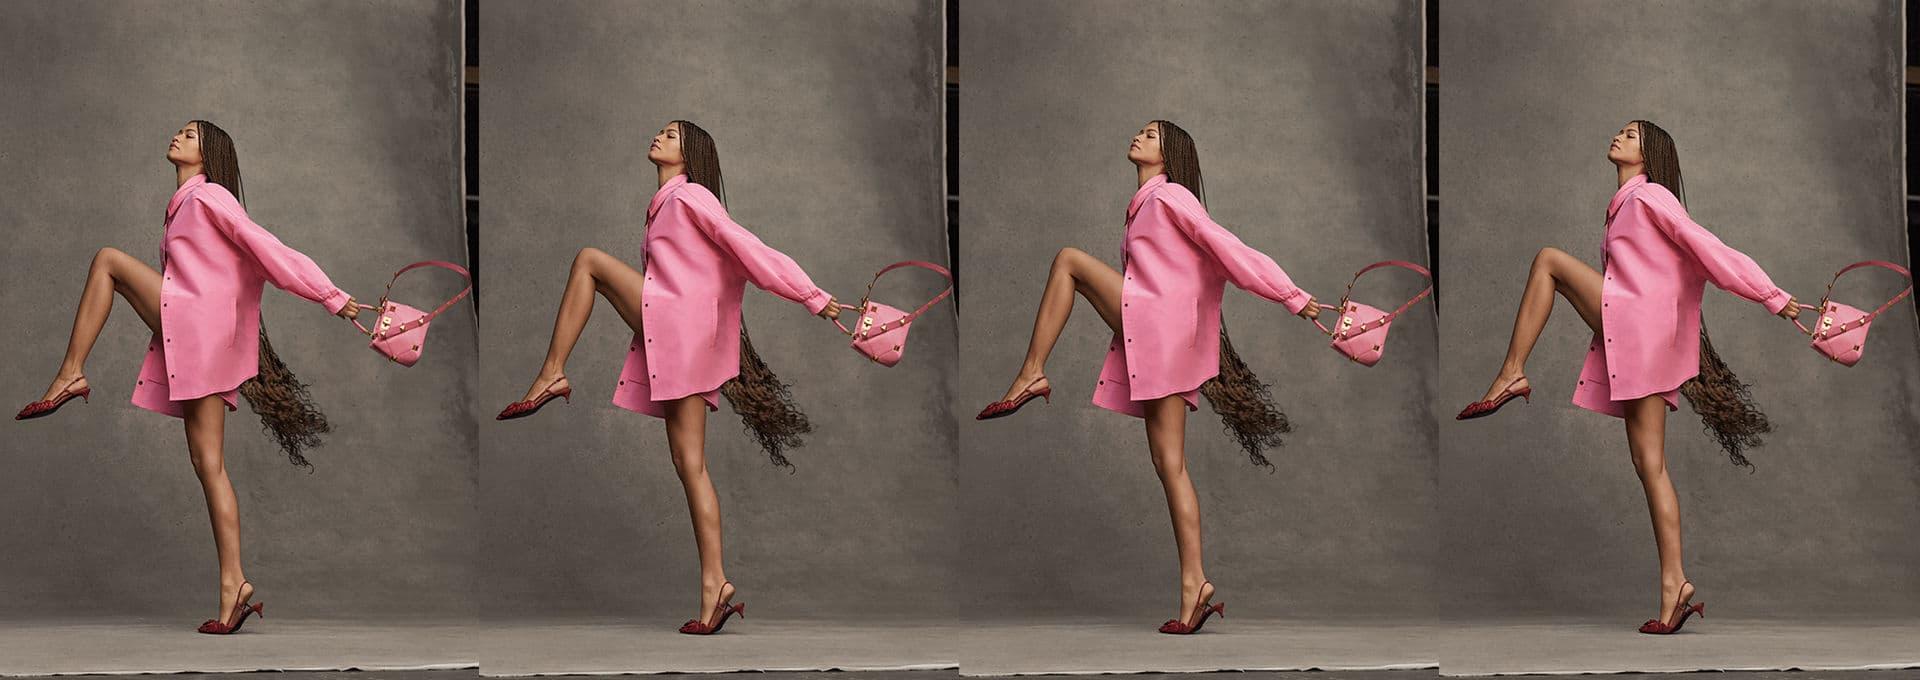 Valentino Spring 2021 Ad Campaign Photos